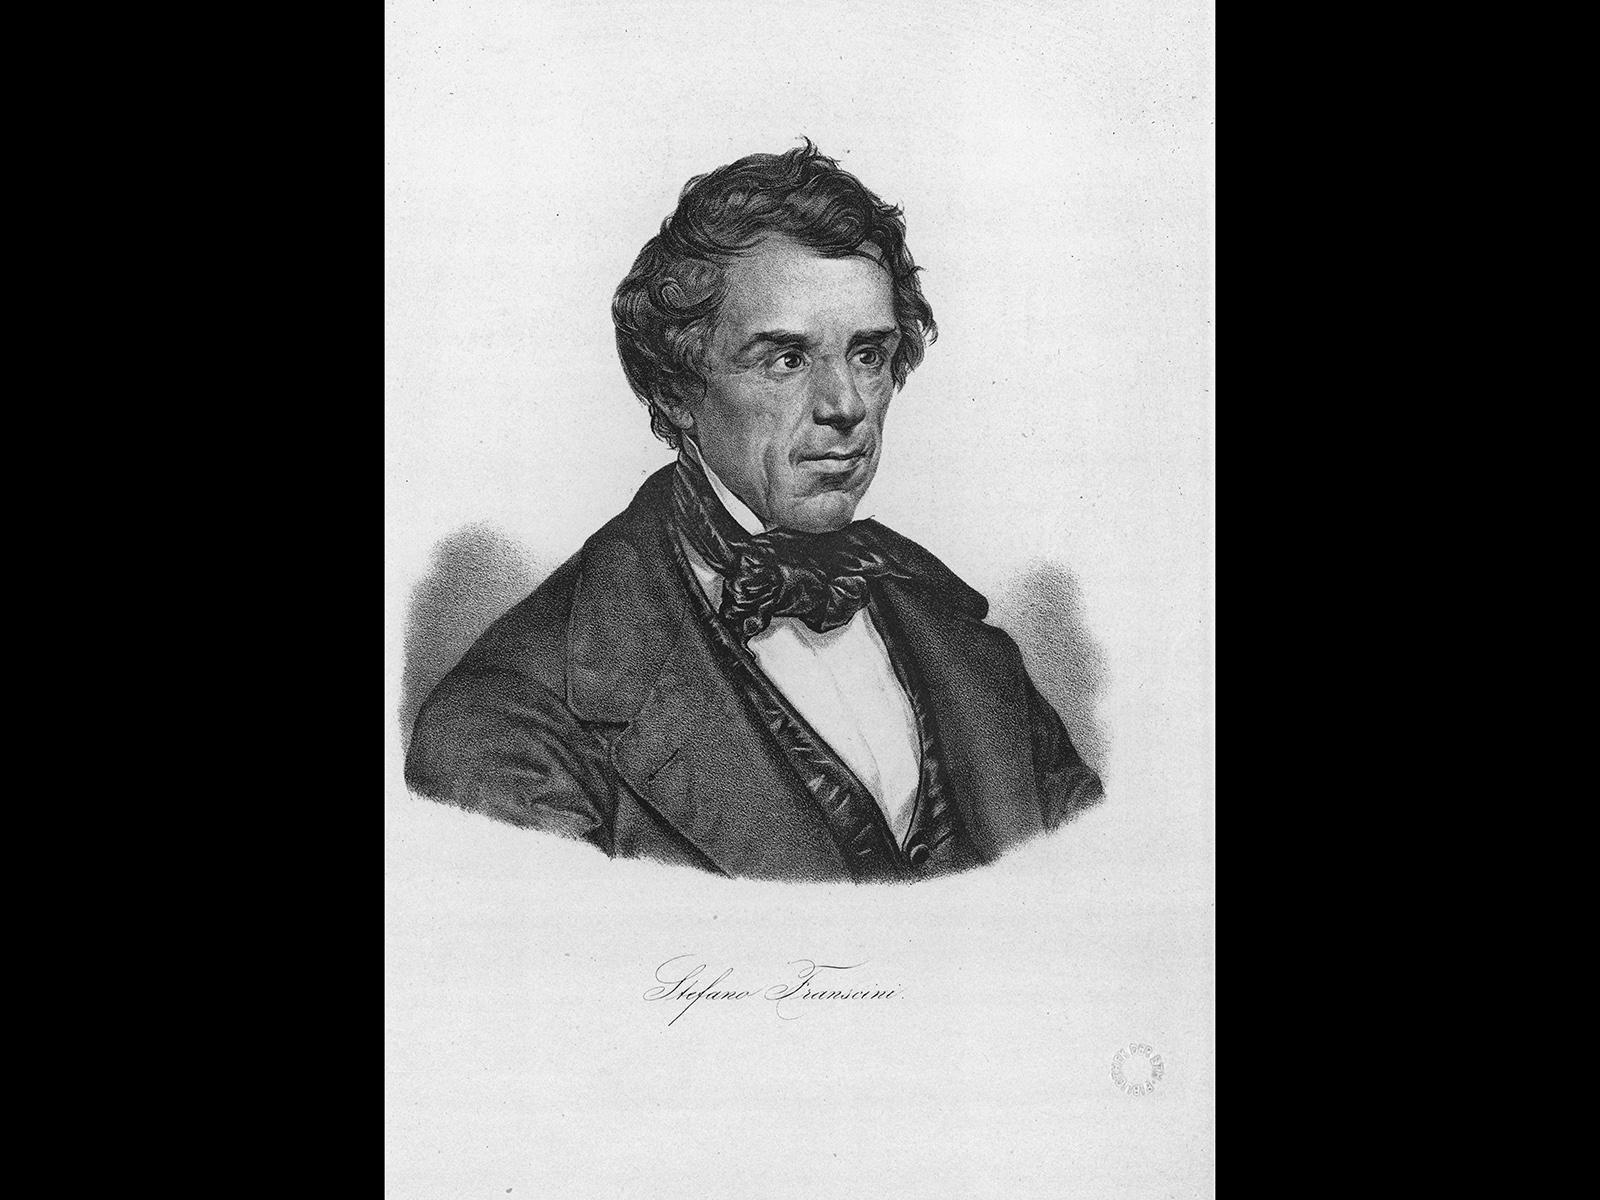 Franscini, Stefano (1796-1857)